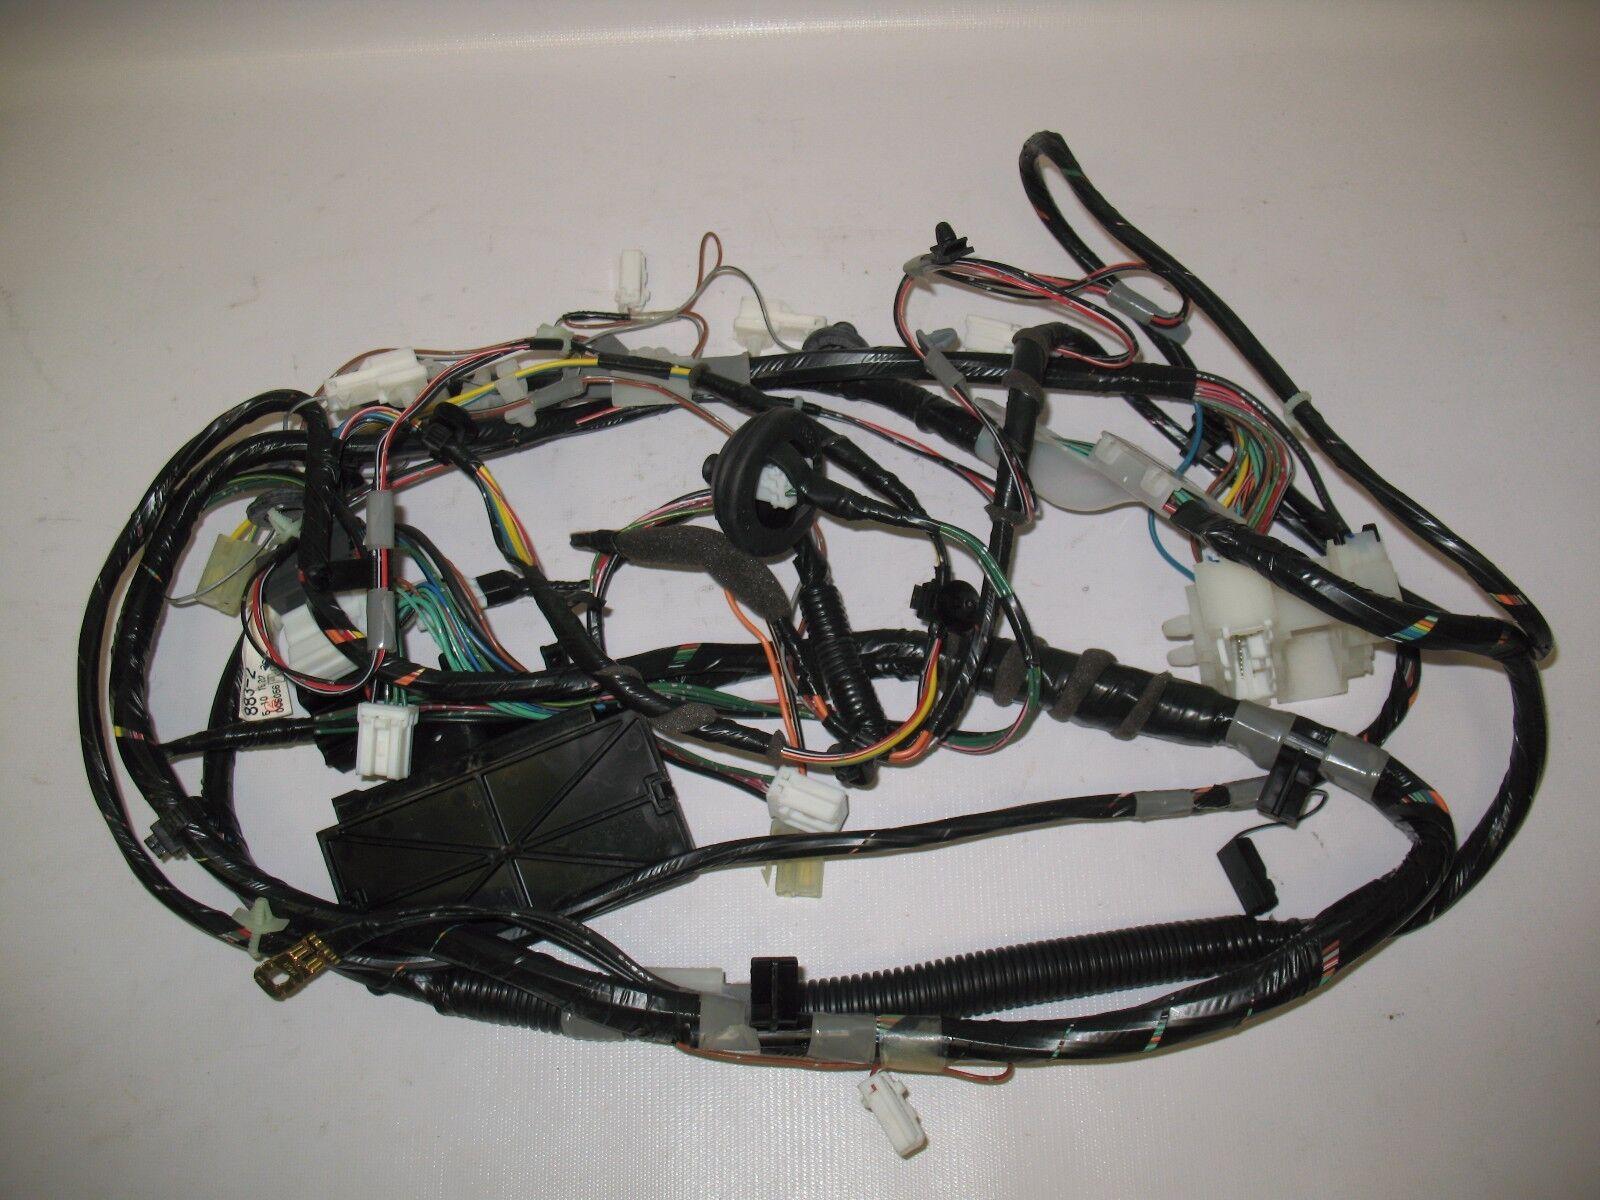 hight resolution of oem 1998 1999 isuzu trooper acura slx rear body wiring harness torque on demand